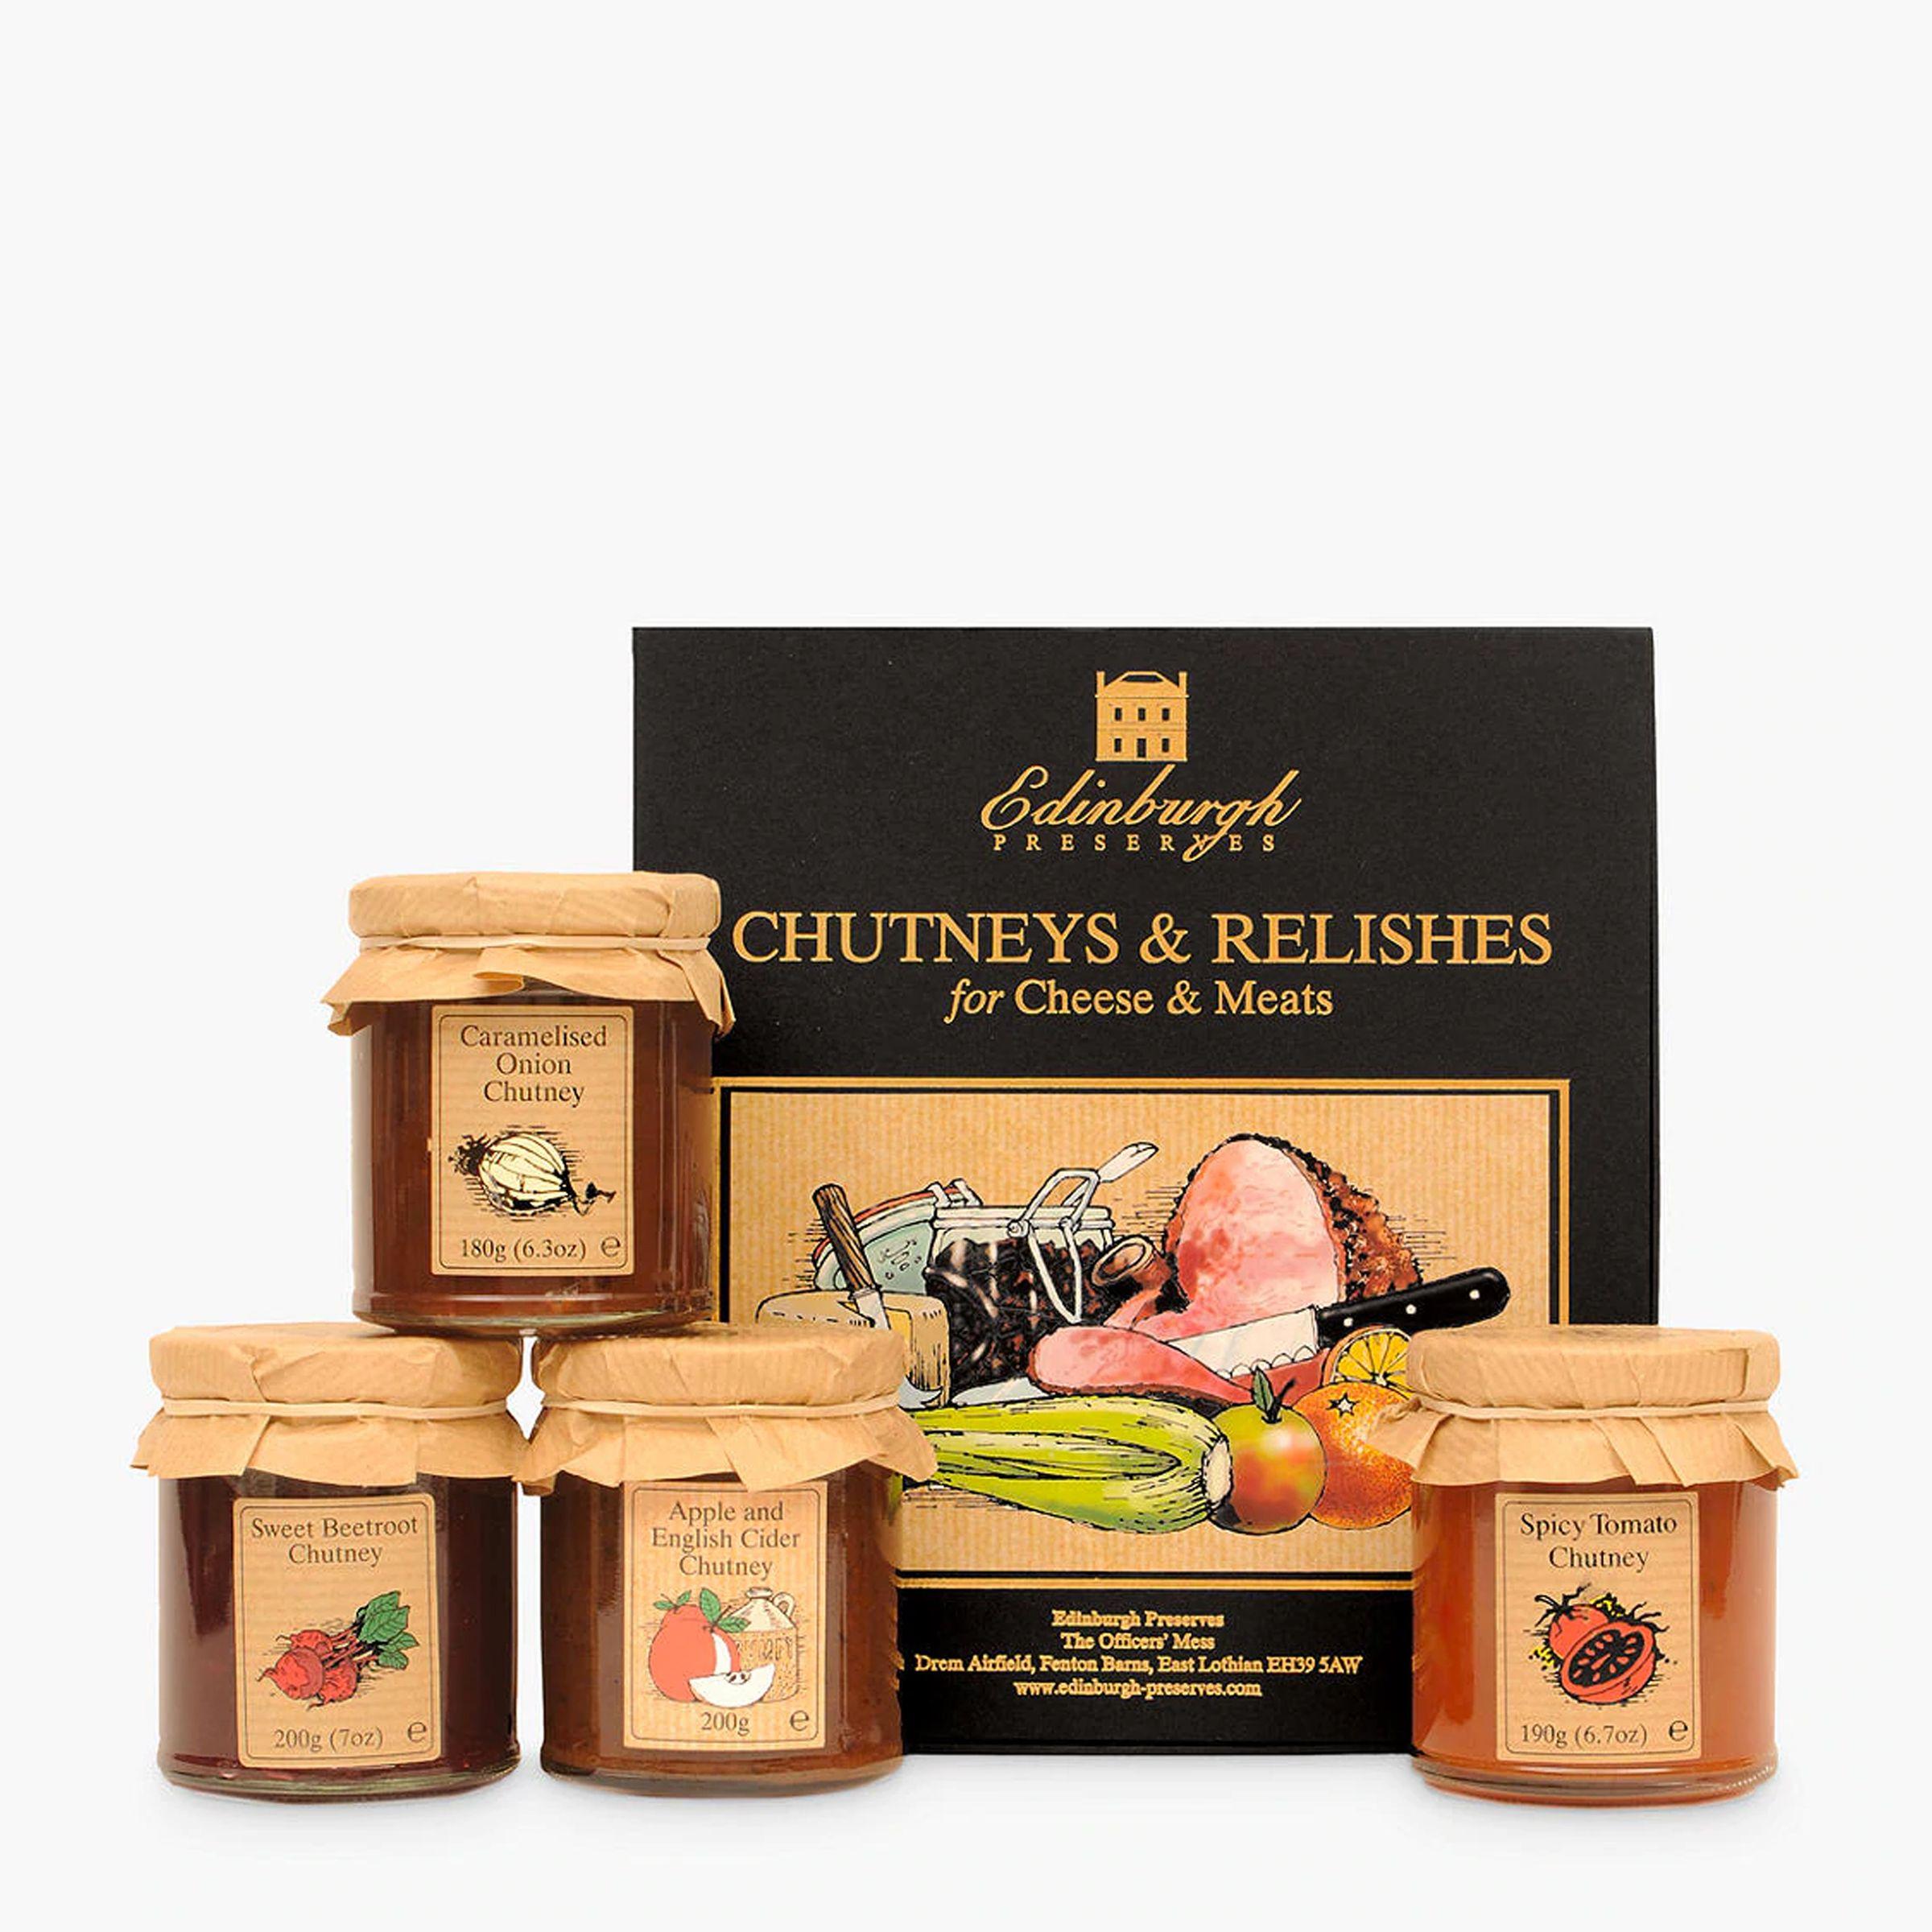 Condiments & preserves